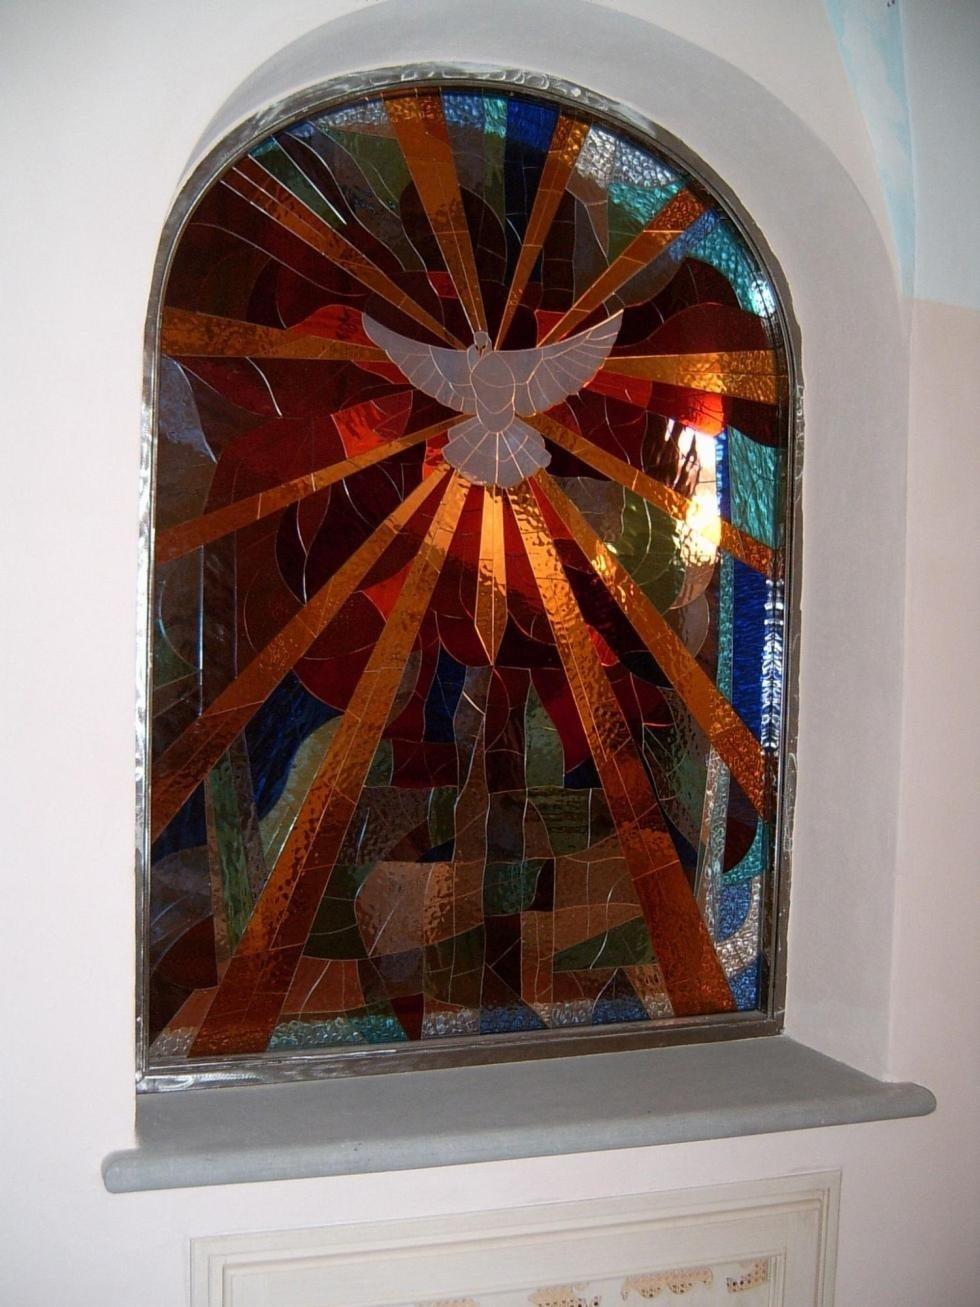 Stilvetro Prato Pistoia Infissi Tende da sole vetreria porte